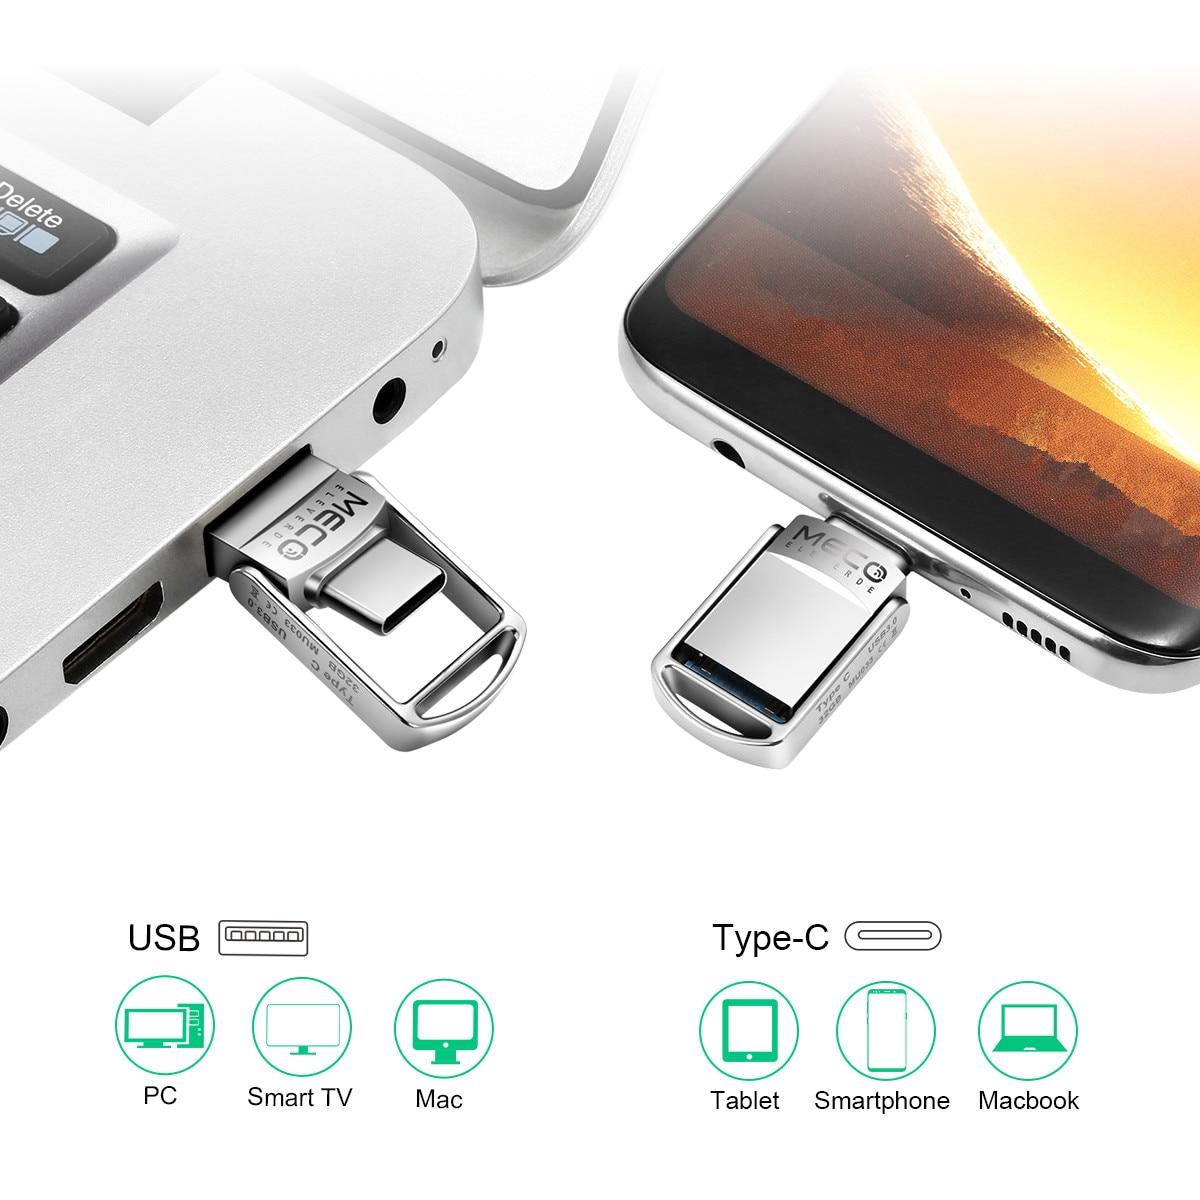 Type C USB Flash Drive otg USB 3.0 Pen Drive 32GB 64GB Pendrive USB Mini Memory Stick Disk For Huawei For Xiaomi Phone Laptops type c flash drive